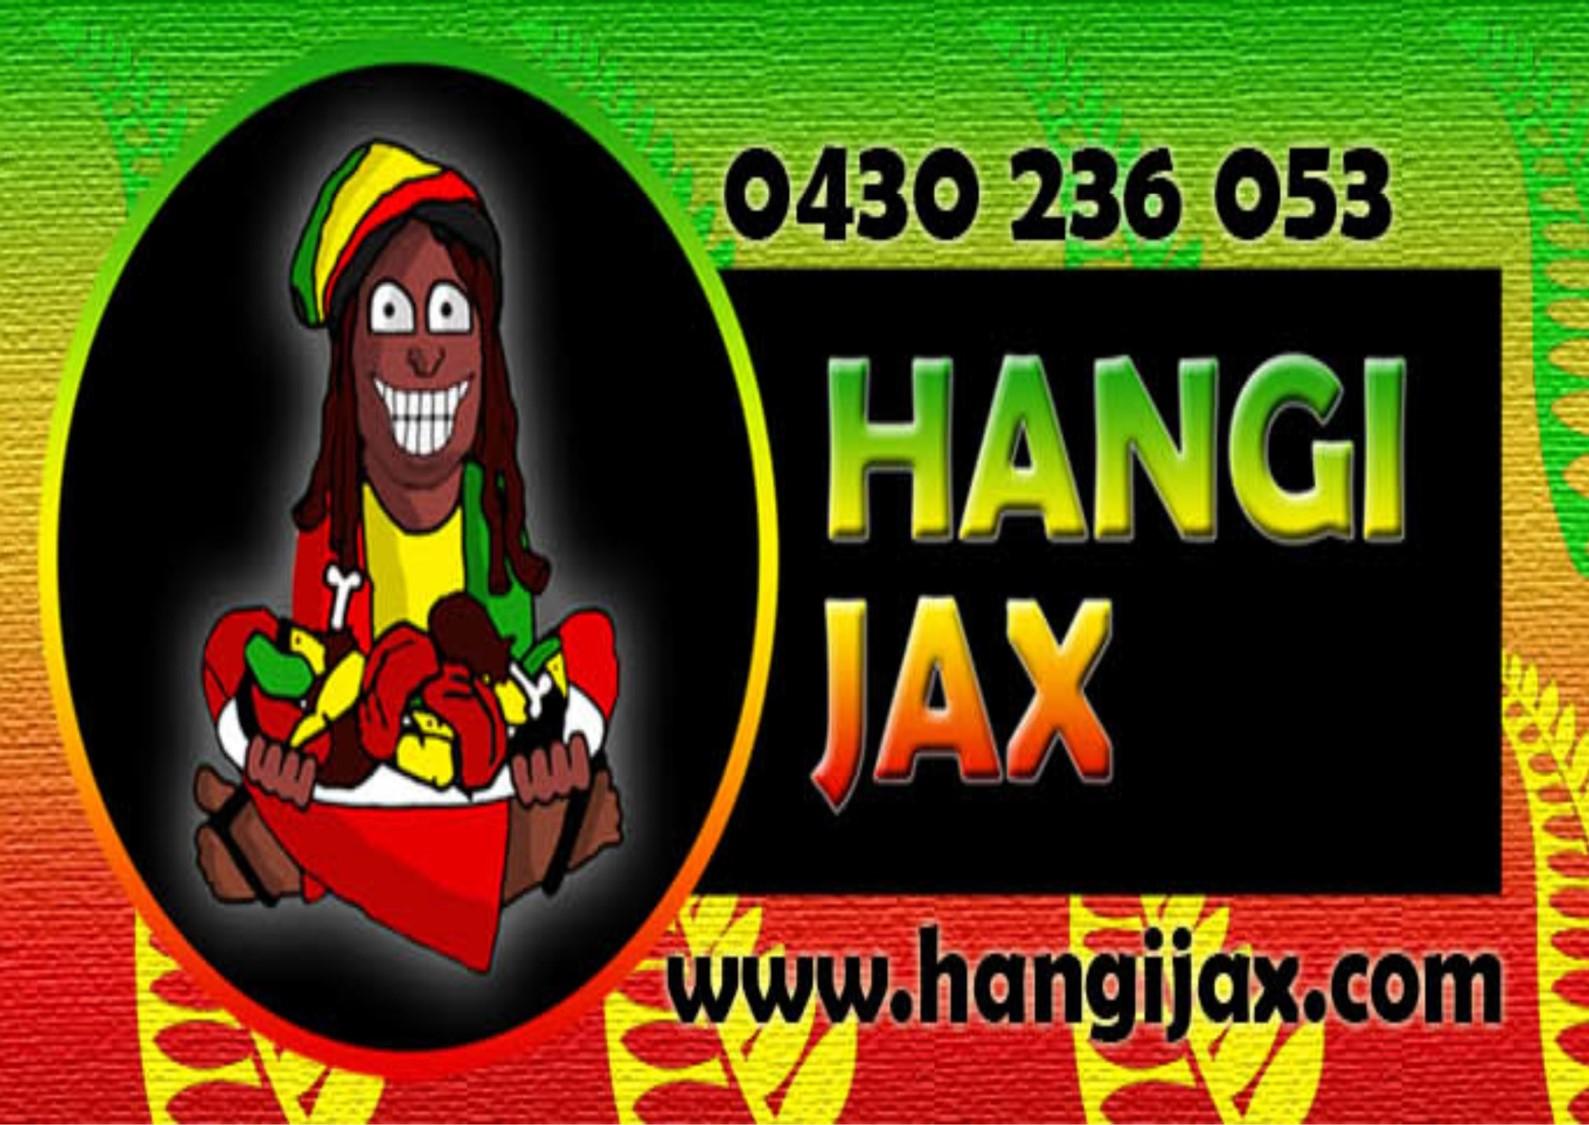 Hangi Jax logo